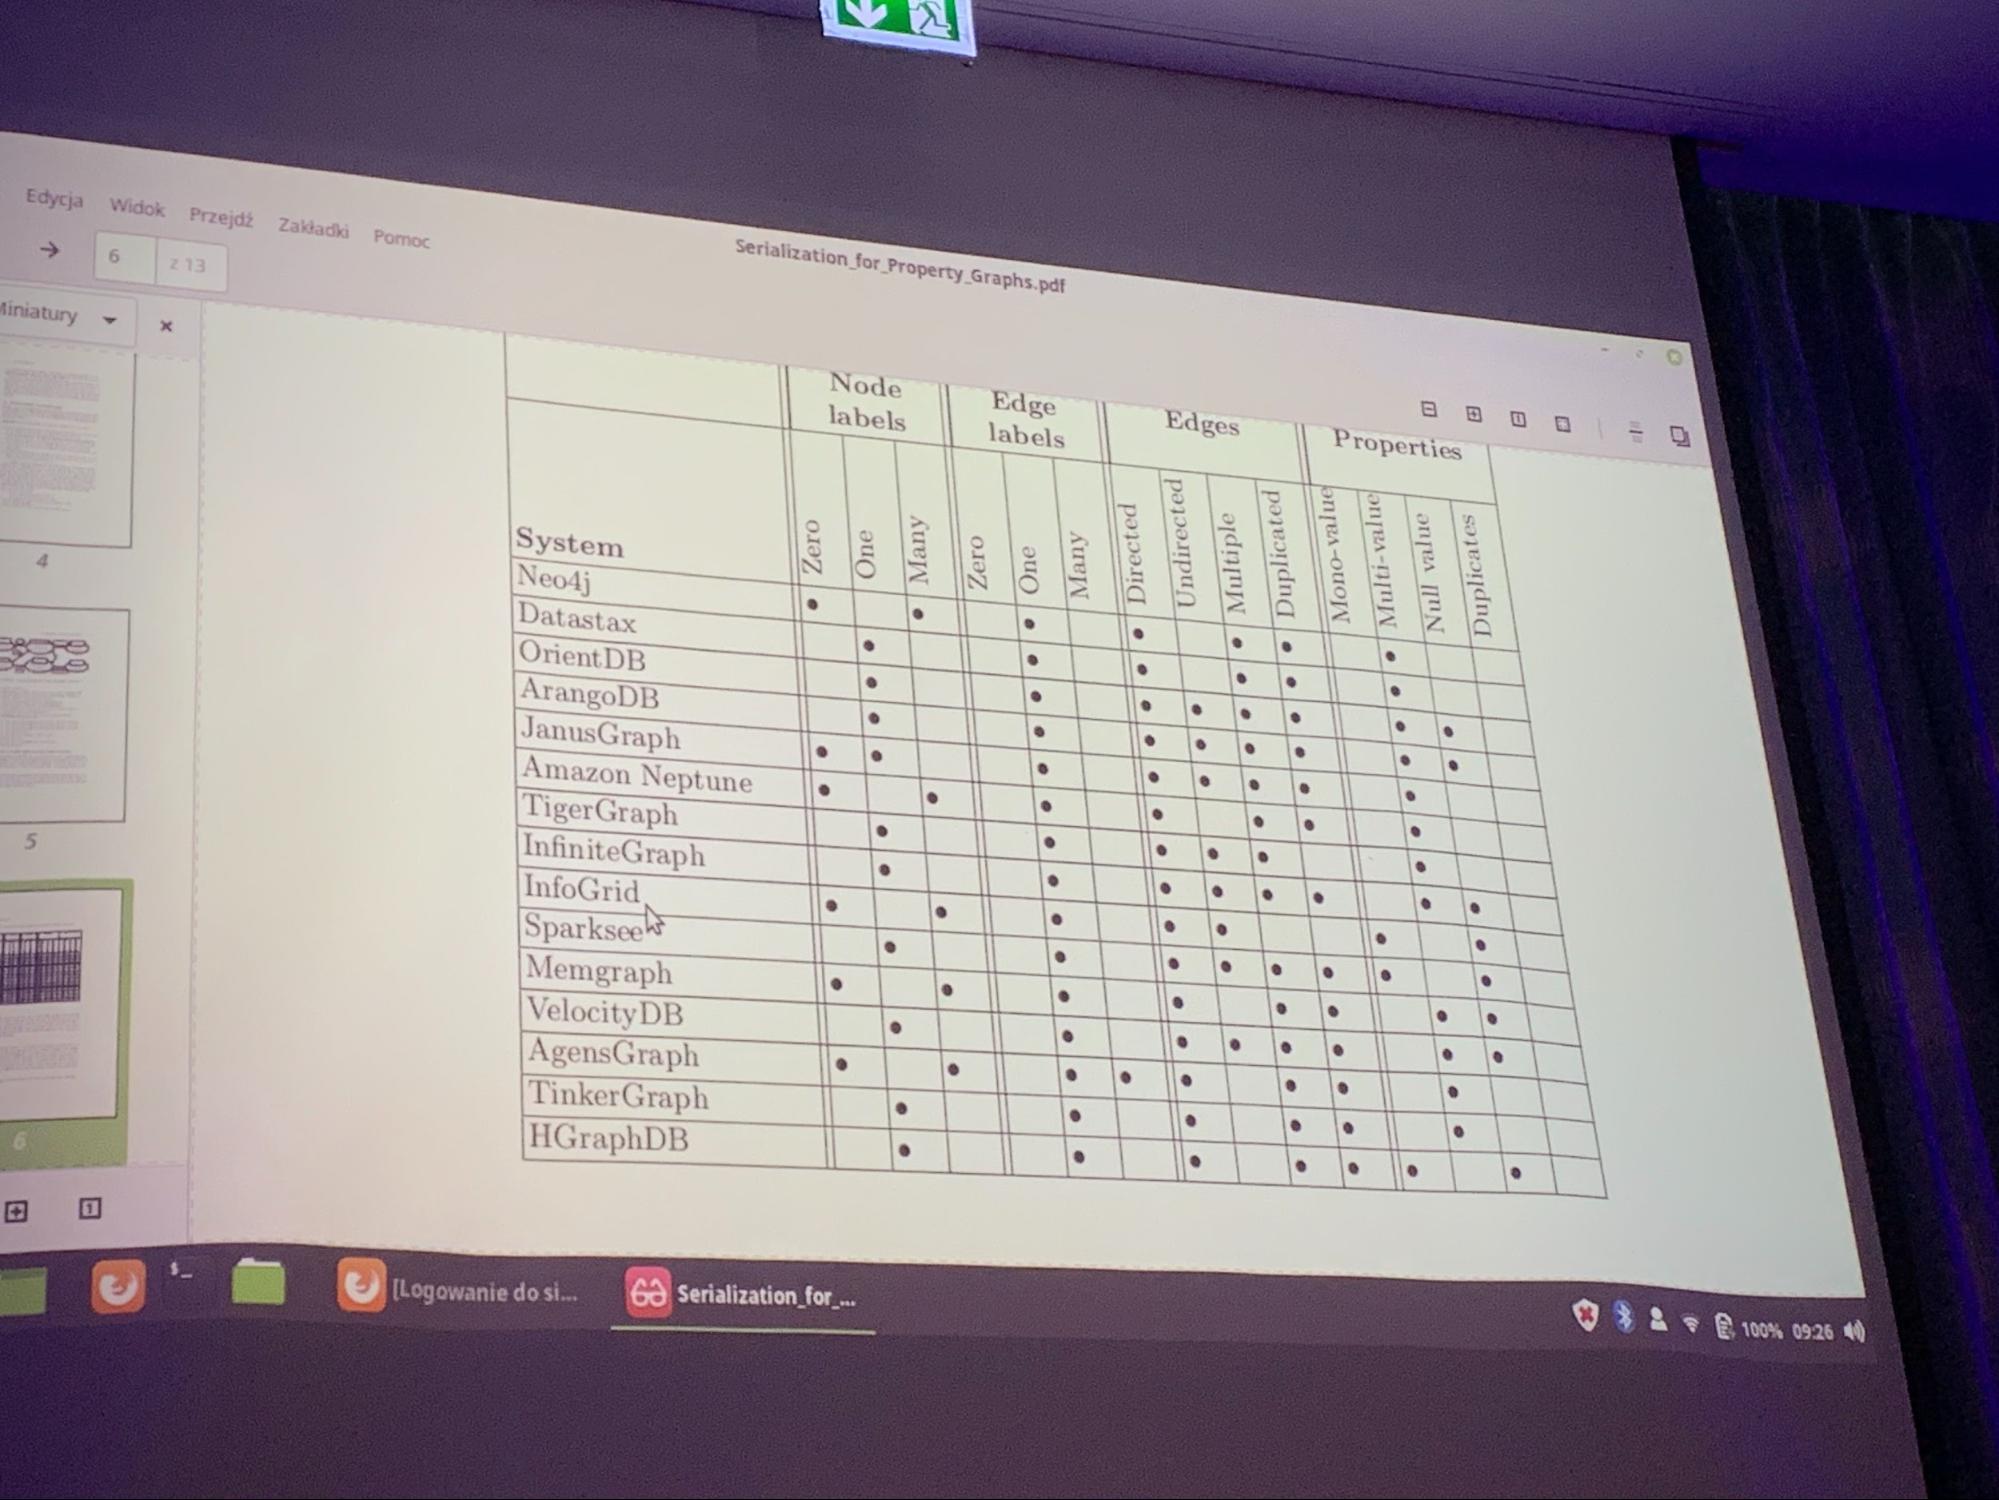 W3C Workshop on Web Standardization for Graph Data